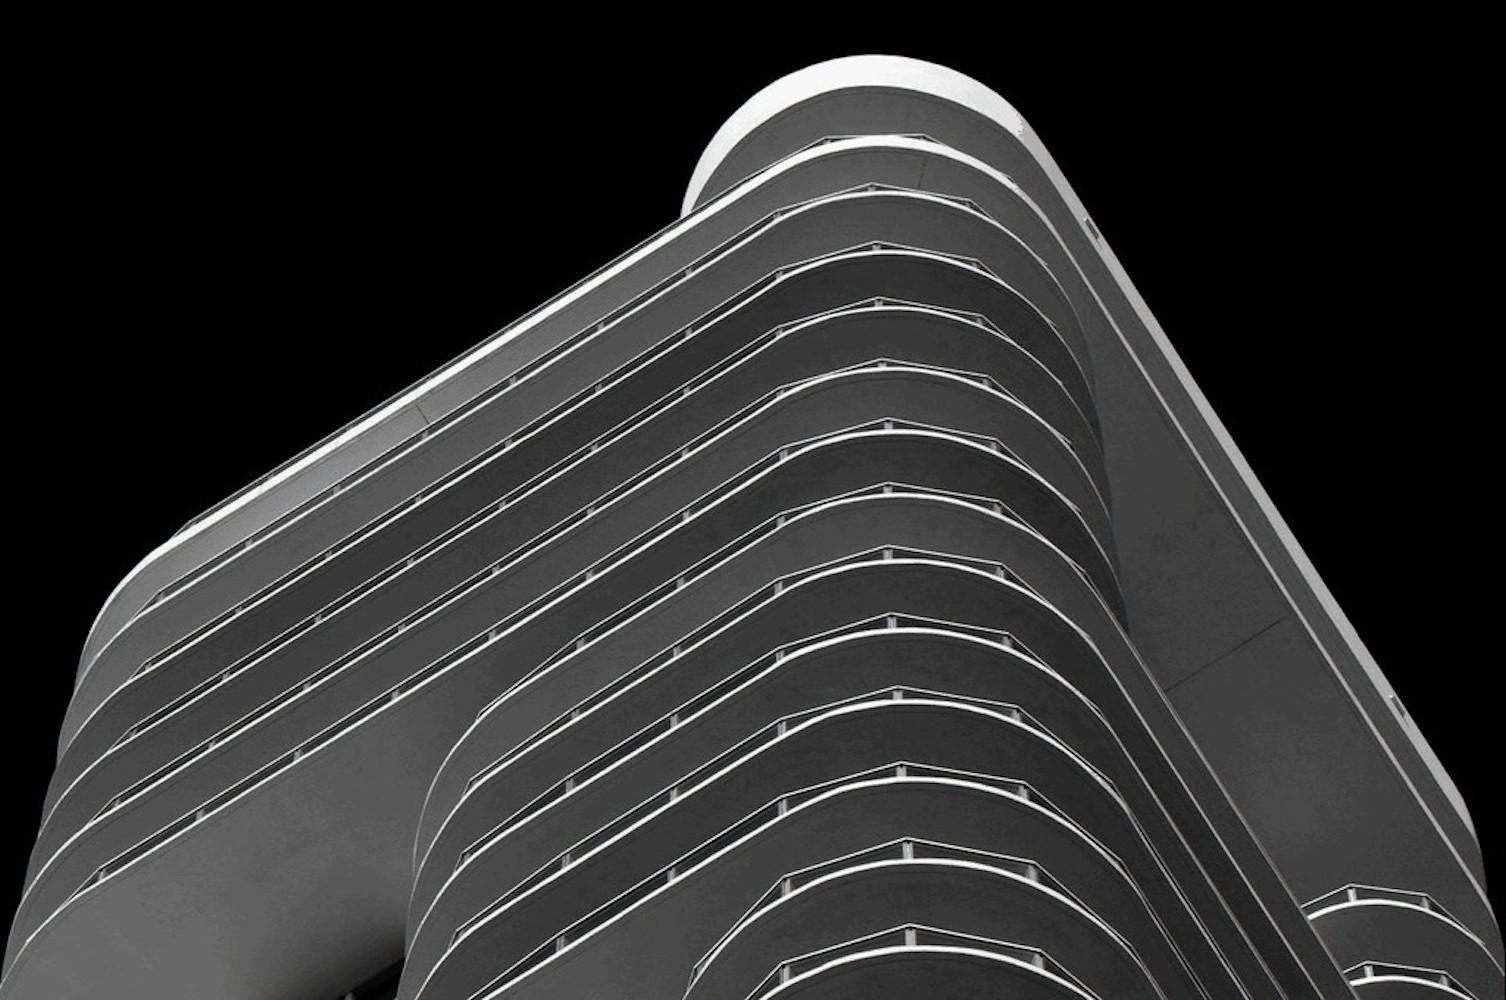 Miami Stripes 1,  Large Black and White Architectural Photograph, 2009